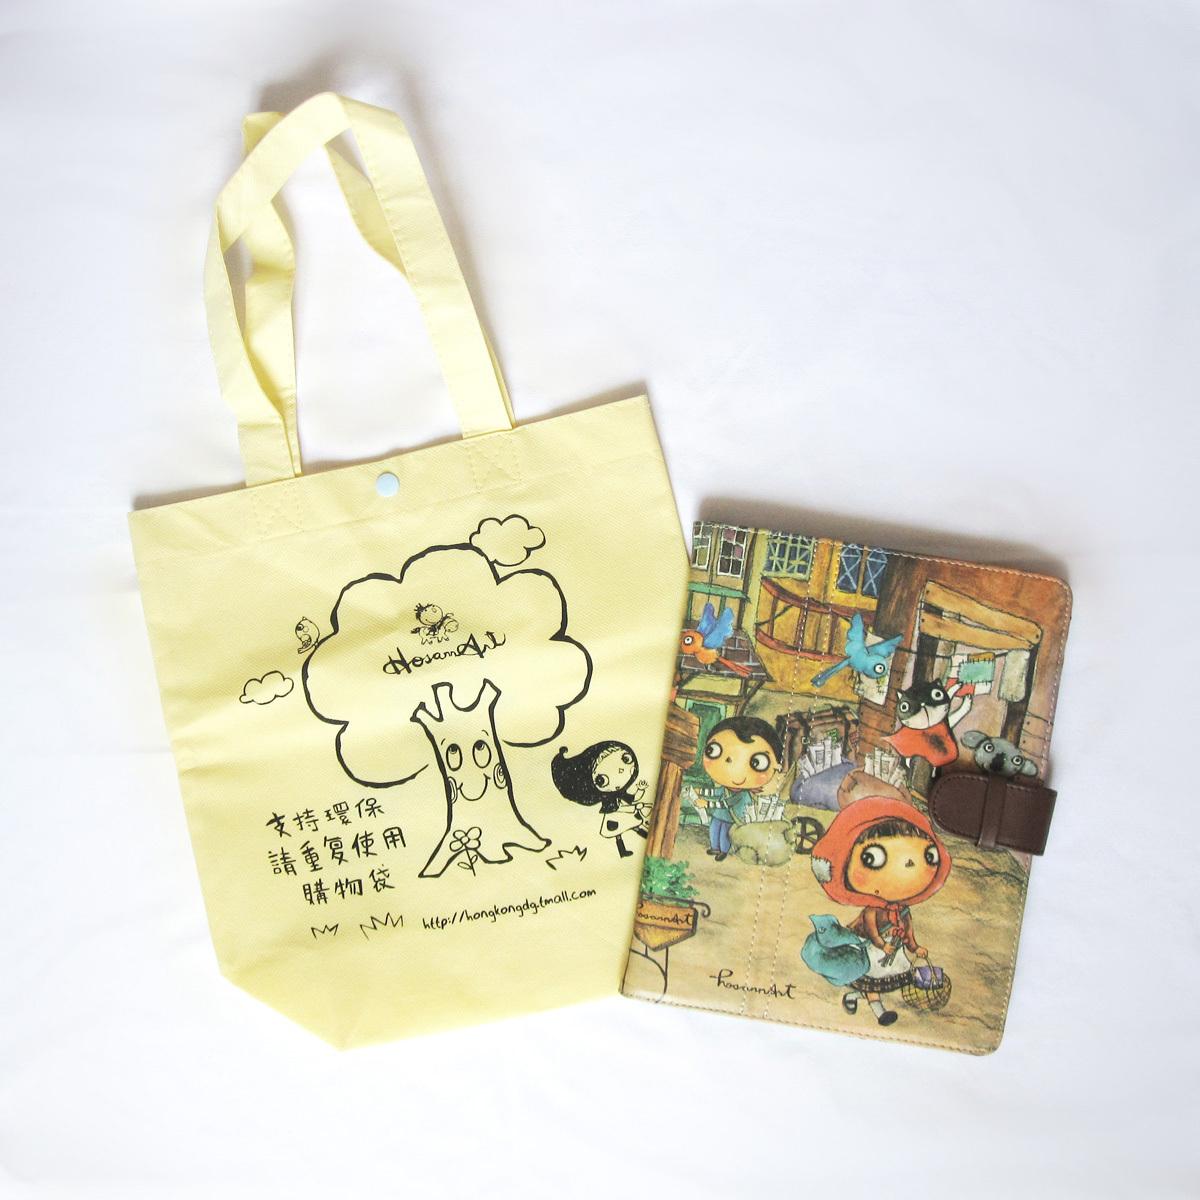 Сумка Hosannart 611ed12pk01yel Женская сумка Нетканый материал